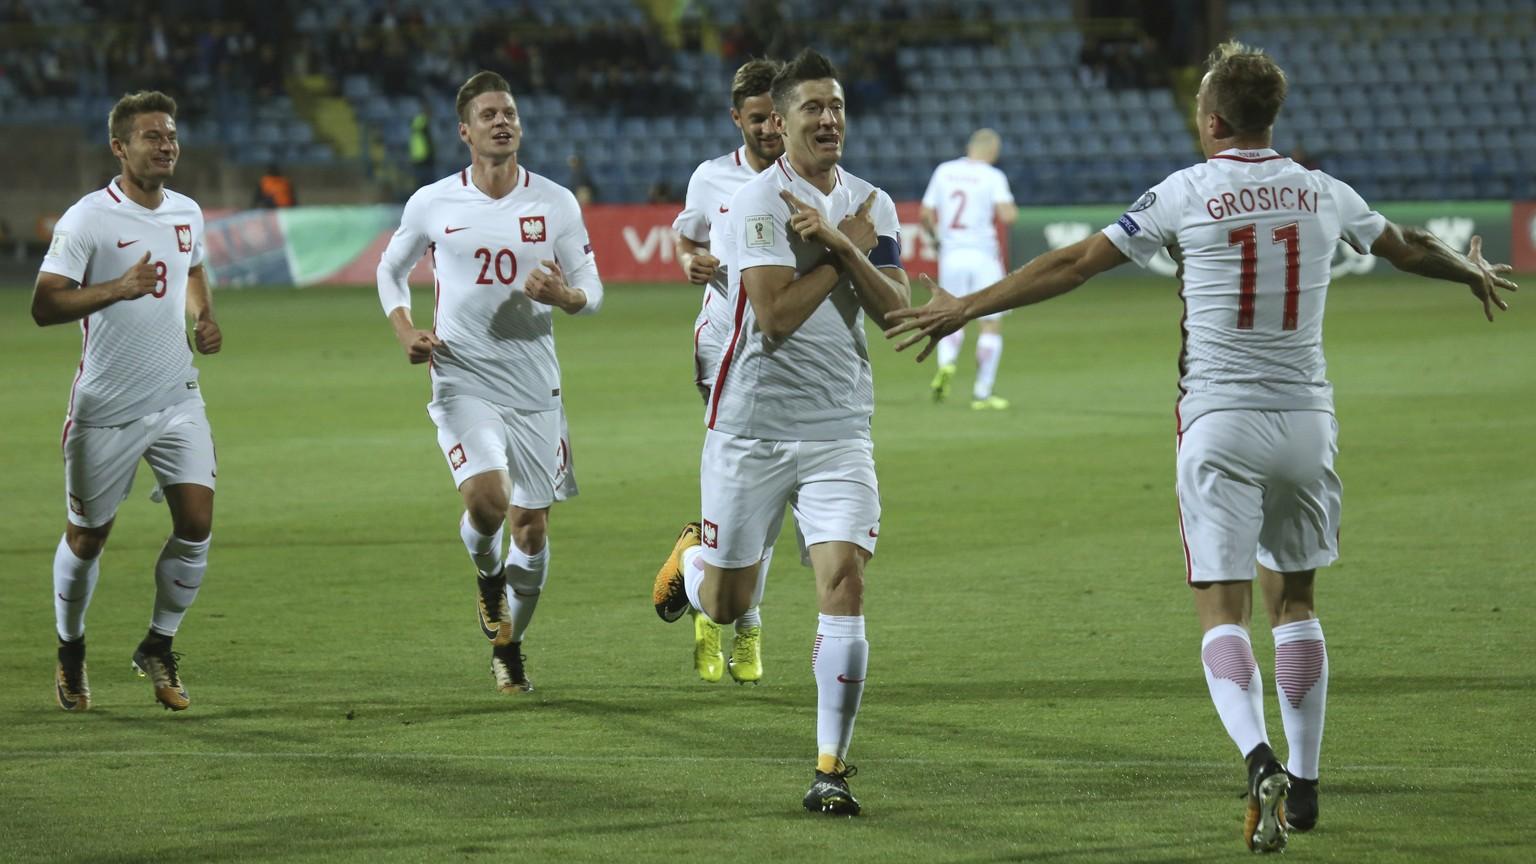 Dreierpack in WM-Quali | Lewandowski Polens Rekordschütze